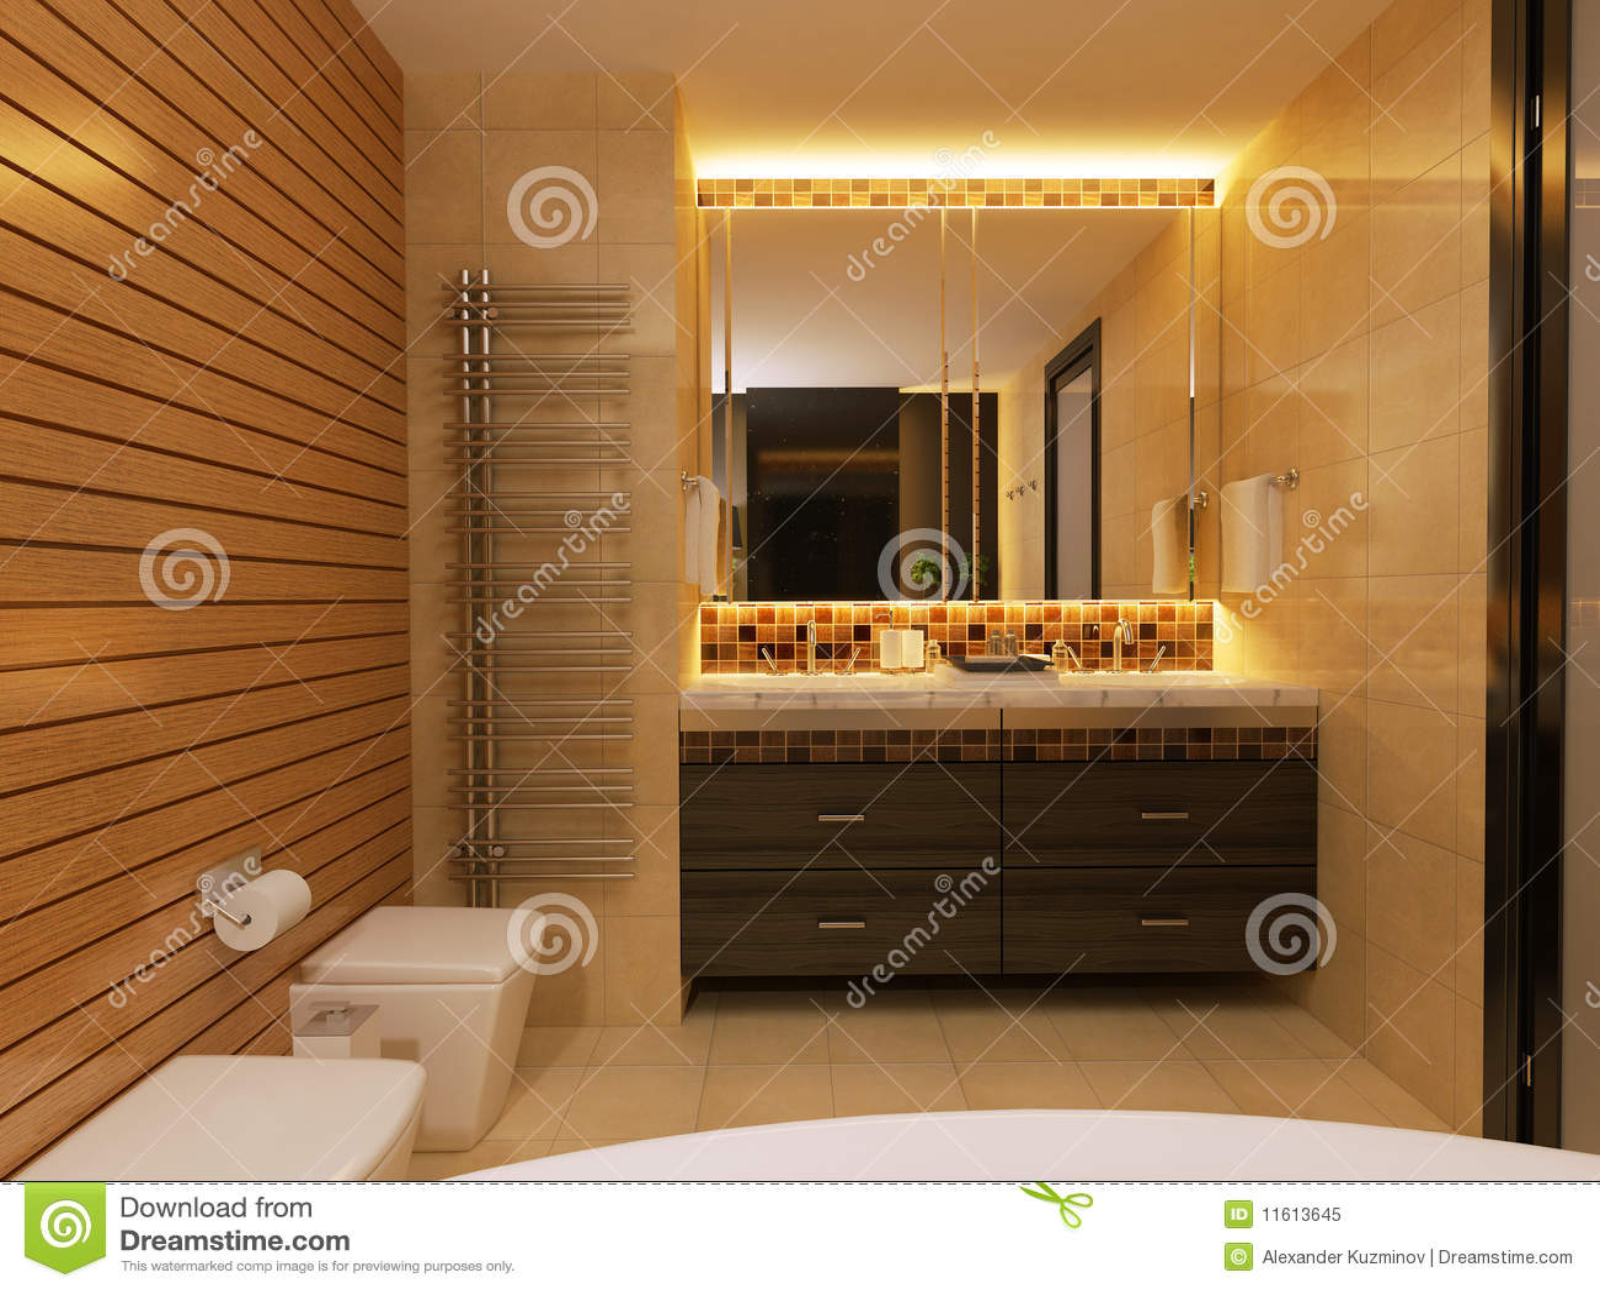 Bathroom mirror dressing tabelle stock abbildung illustration